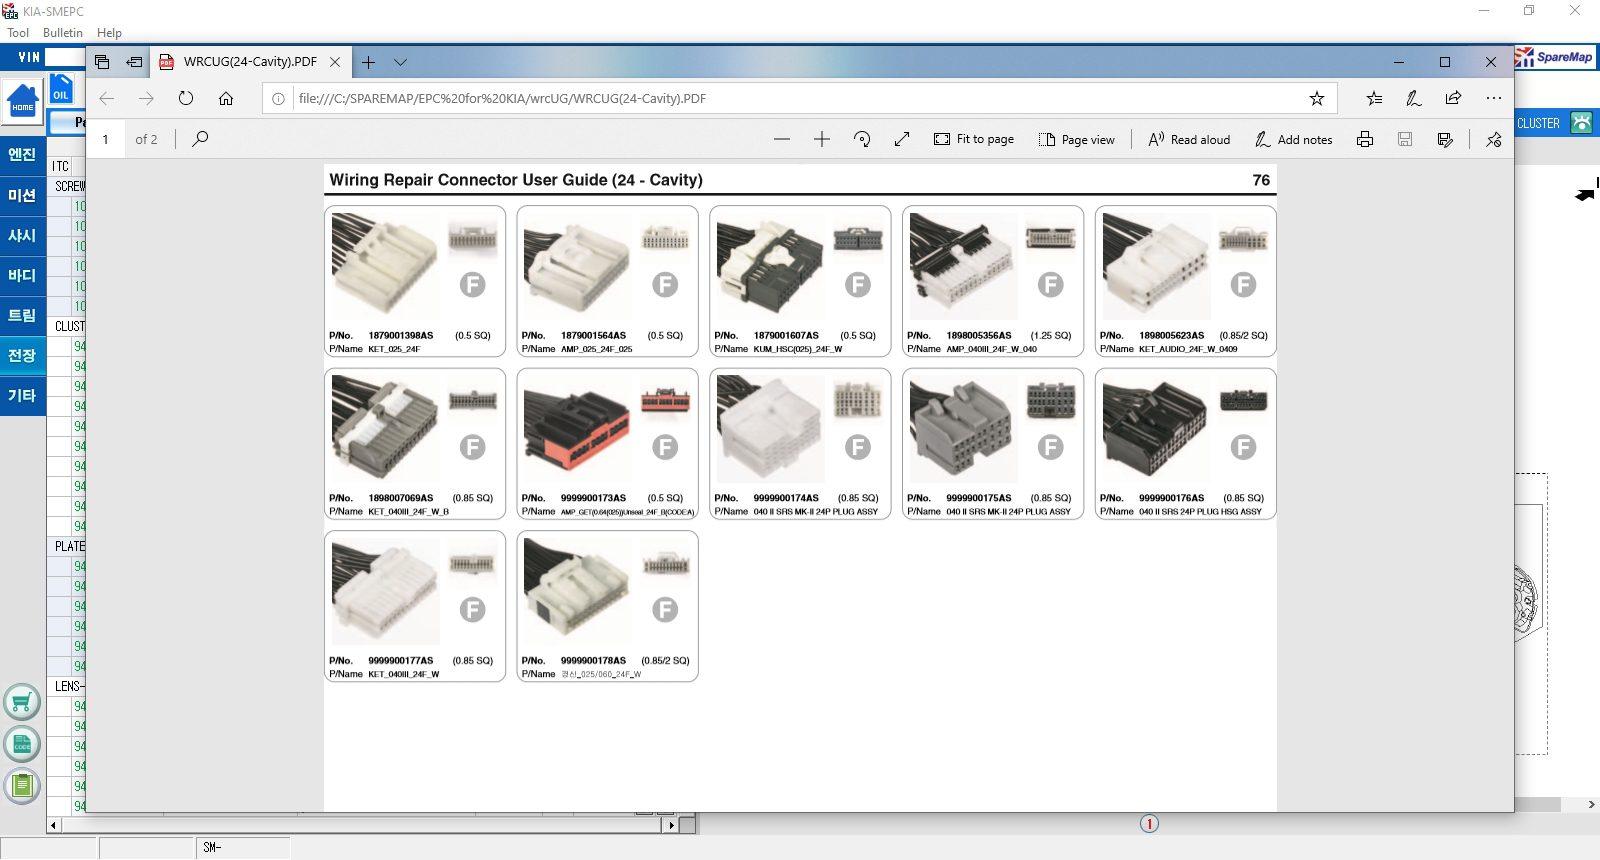 Hyundai_Kia_Korea_SM_EPC_072019_Parts_Catalog_Domestic_Market_10